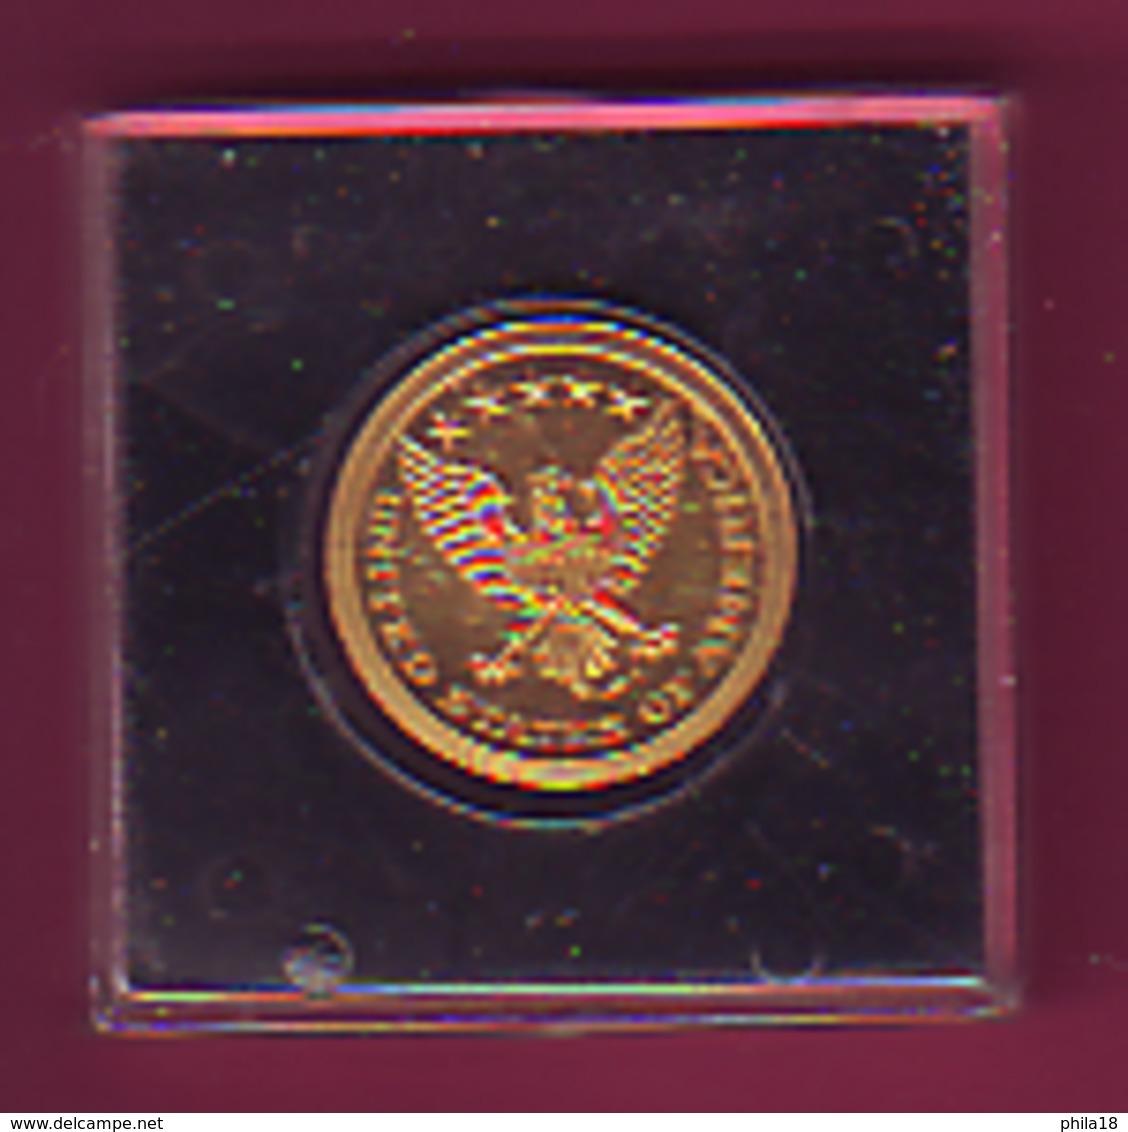 FRAPPE MONNAIE DE PARIS EDITION COMMEMO OR PUR 999/1000 KENNEDY JONN F- ROBERT F  AIGLE UNITED STATES OF AMERICA - Non Classés